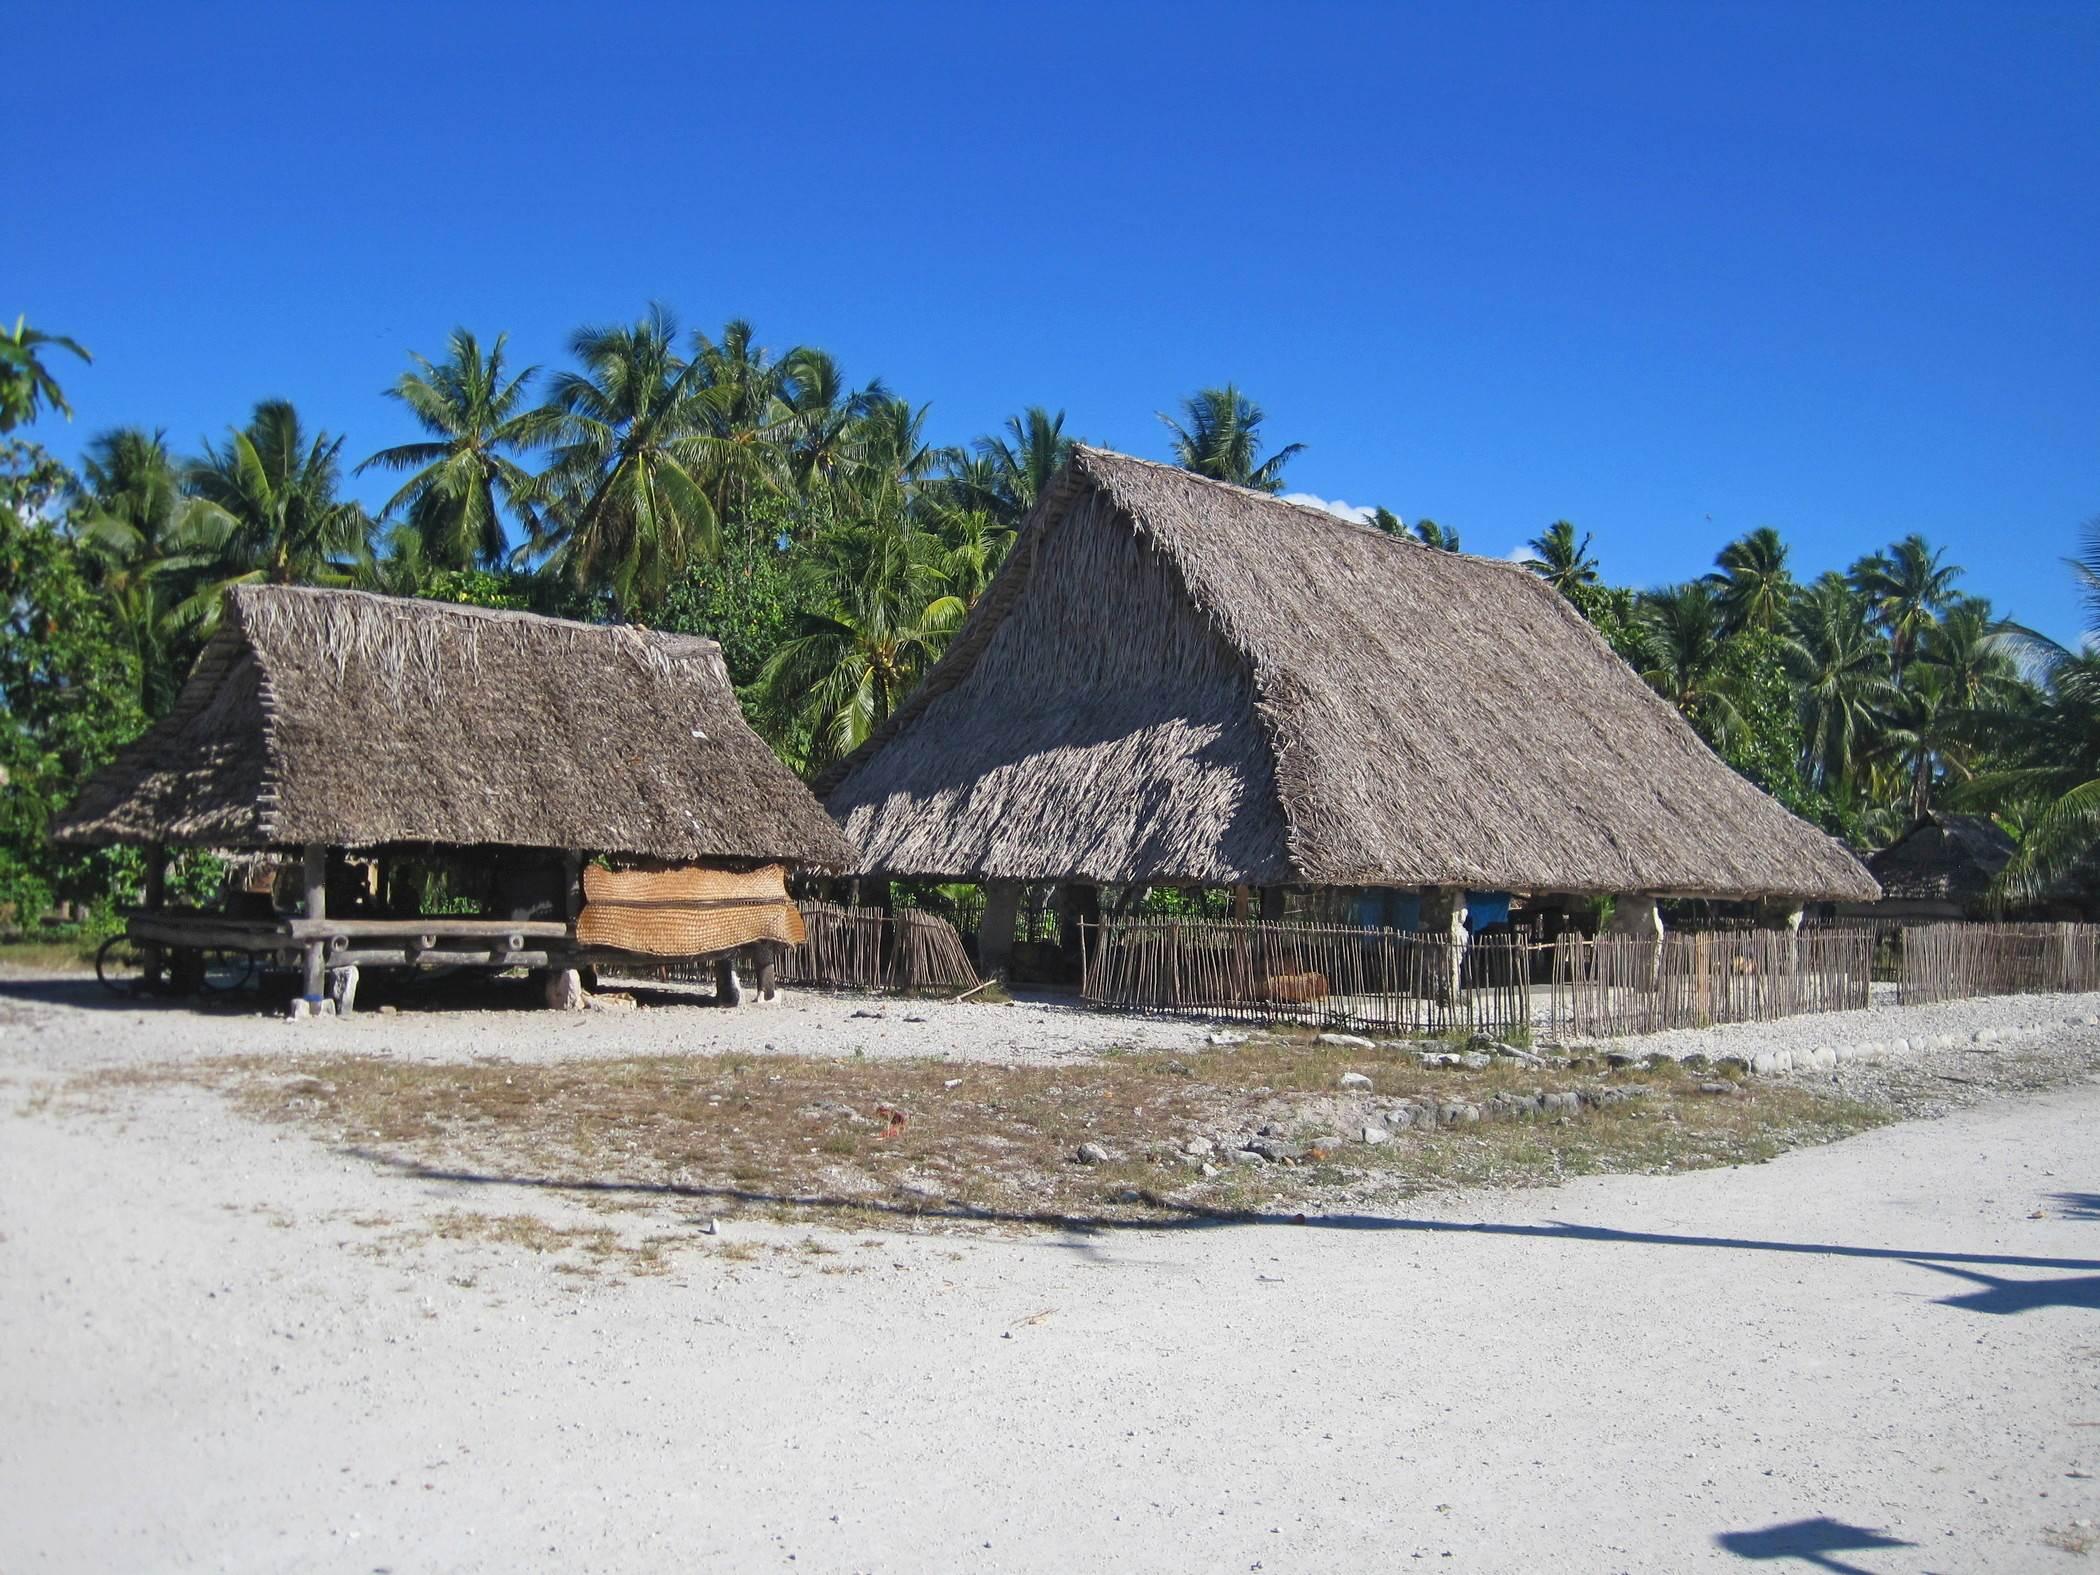 Zabudowa Kiribati Ocean Spokojny